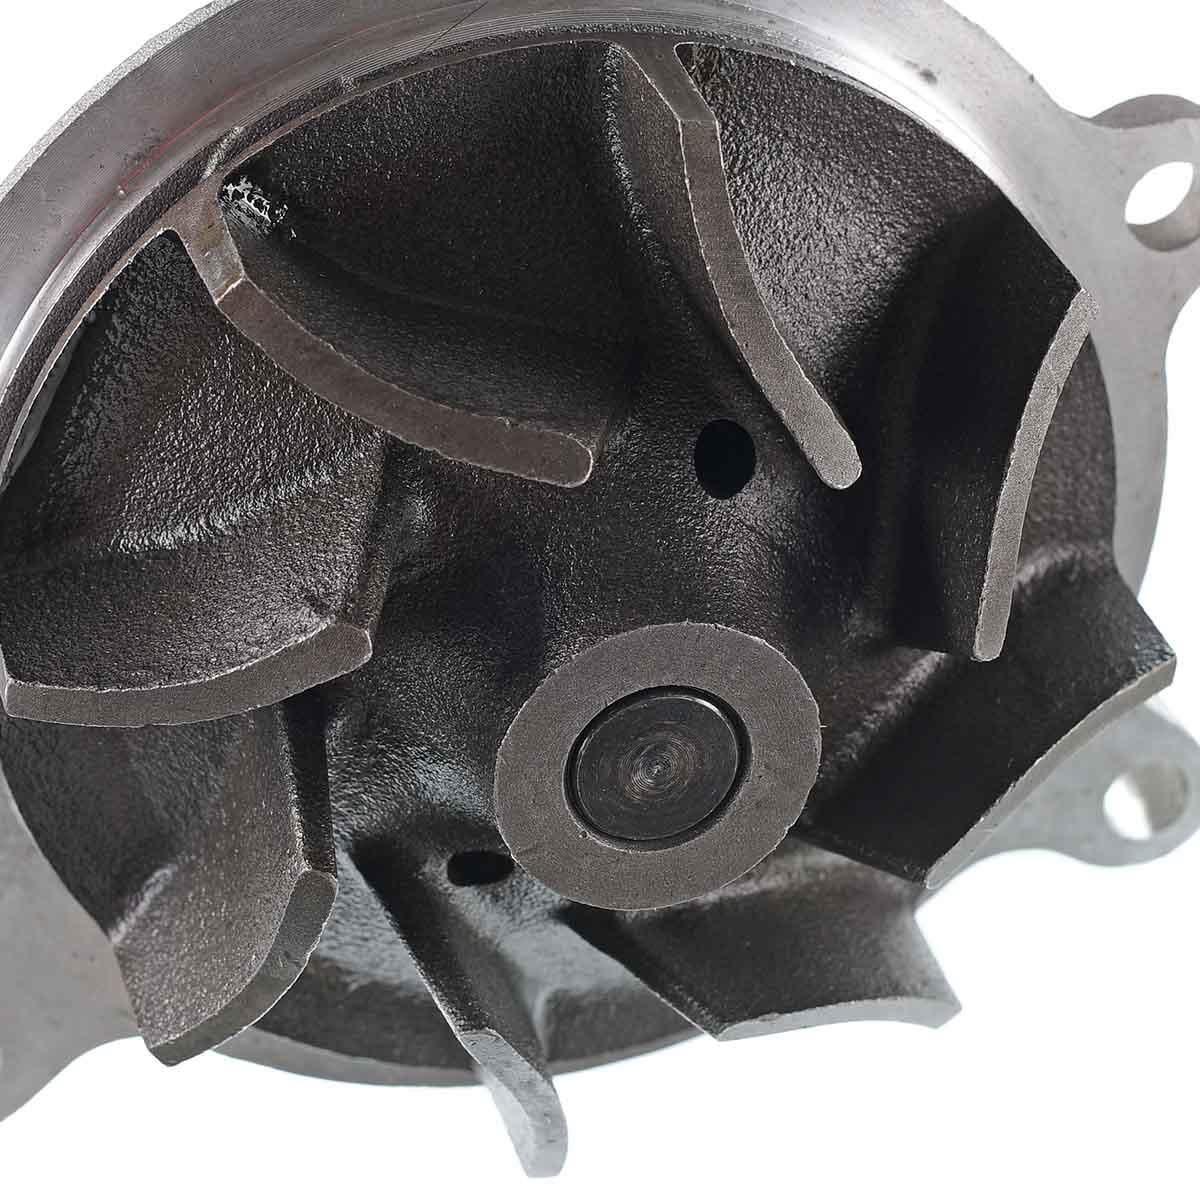 Water Pump For Chevrolet Silverado 2500hd 3500hd C4500 C5500 Kodiak Gmc Topkick Chevy Express Savana Sierra 97372515 98031233 Aw60536 In Pumps From